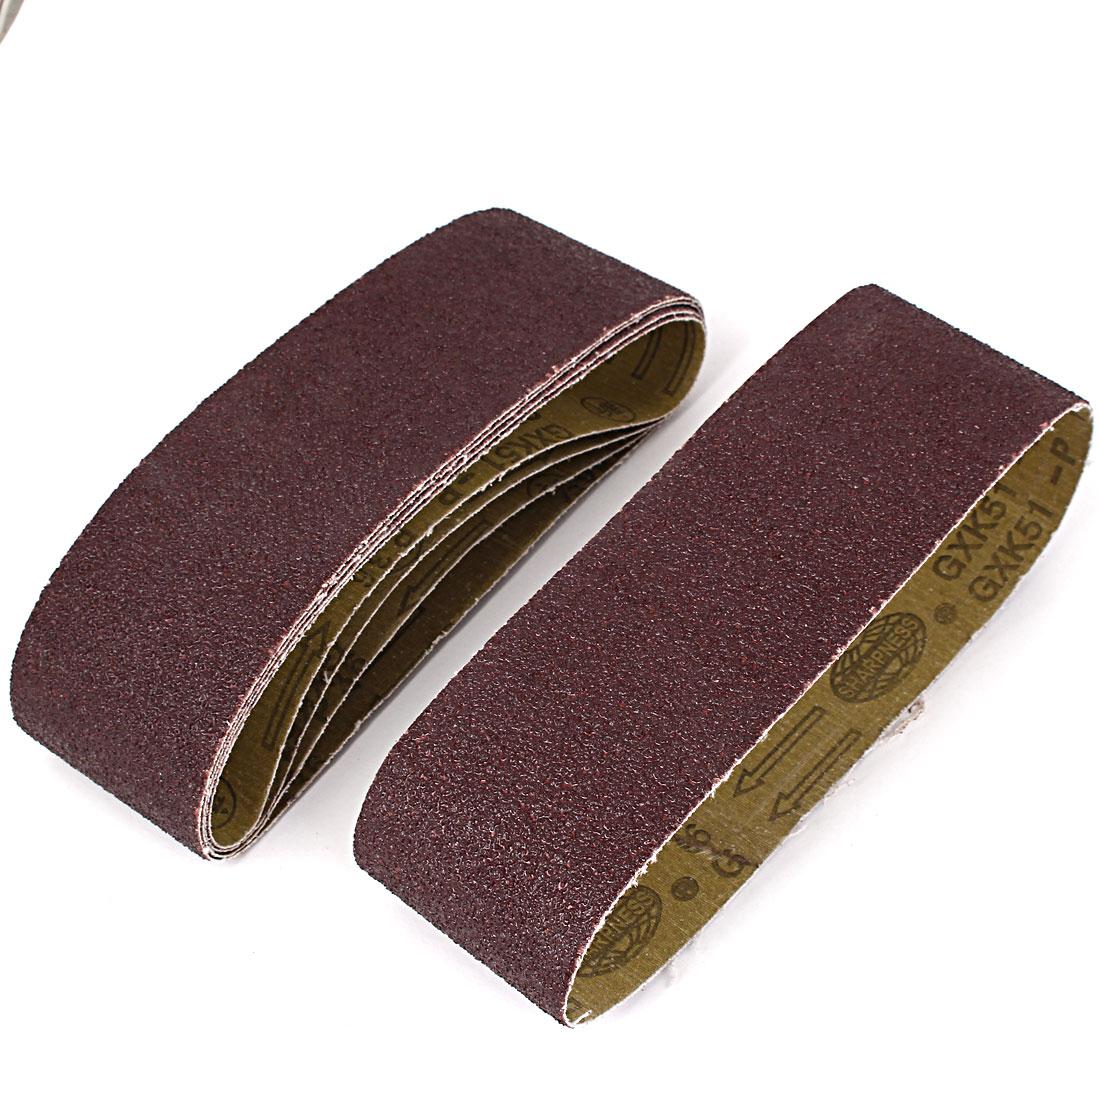 Sander Polishing Machine 533x75mm 36 Grit Abrasive Sanding Belt Sandpaper 5pcs